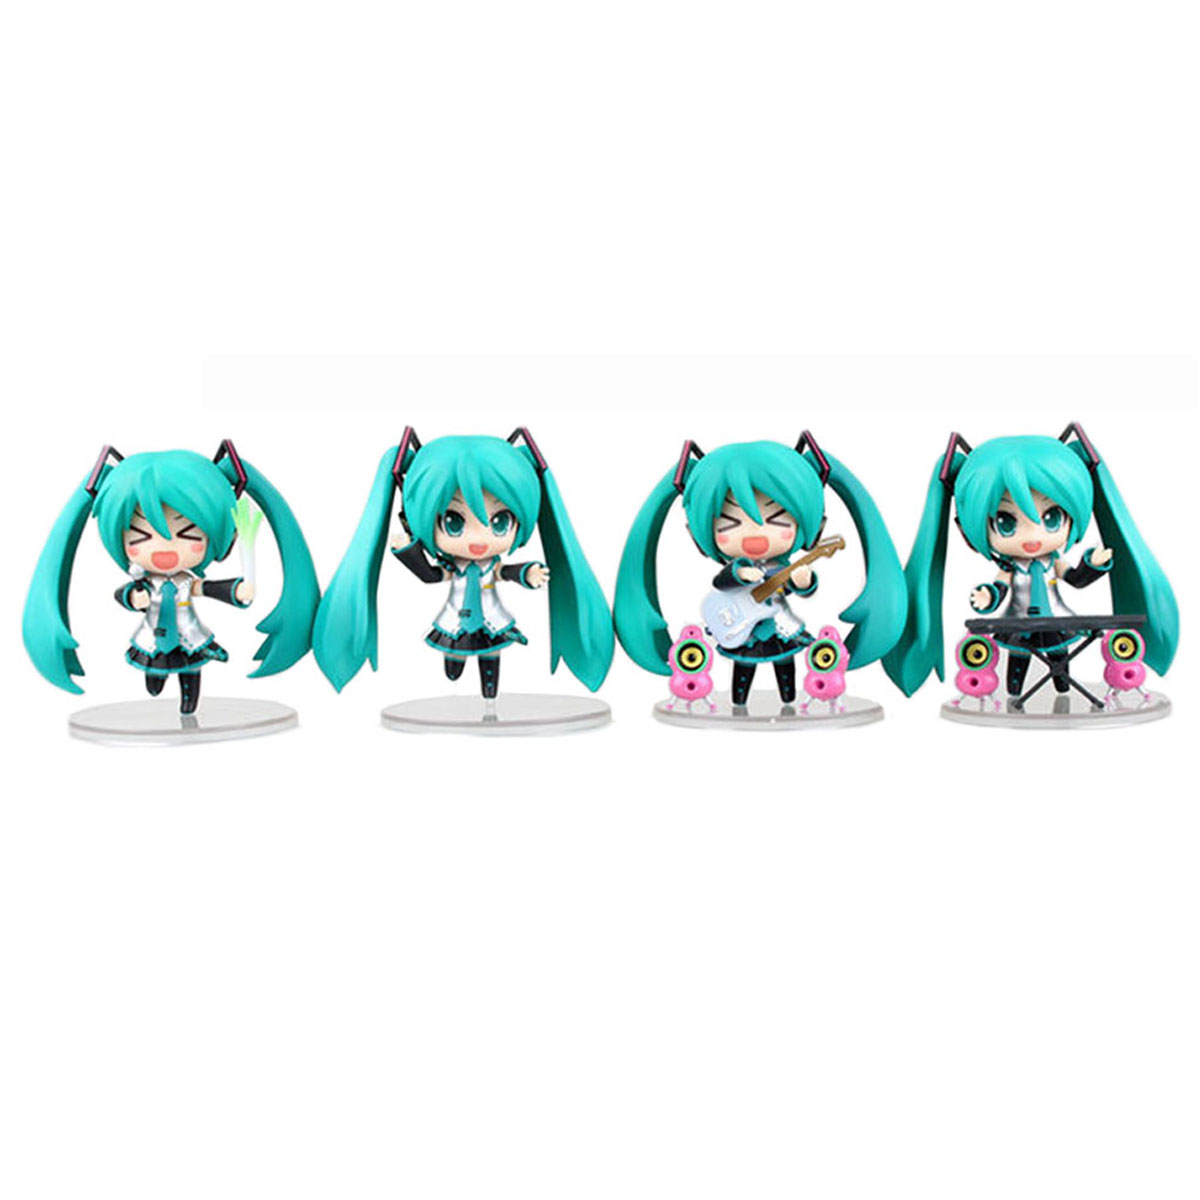 Chanycore Janpan Vocaloid Hatsune Miku Anime Figure Cute Miku Guitar Band Ver. PVC Figure Collection Model Doll Toy 10cm 170 cute hatsune miku face changeable figure garage kit set